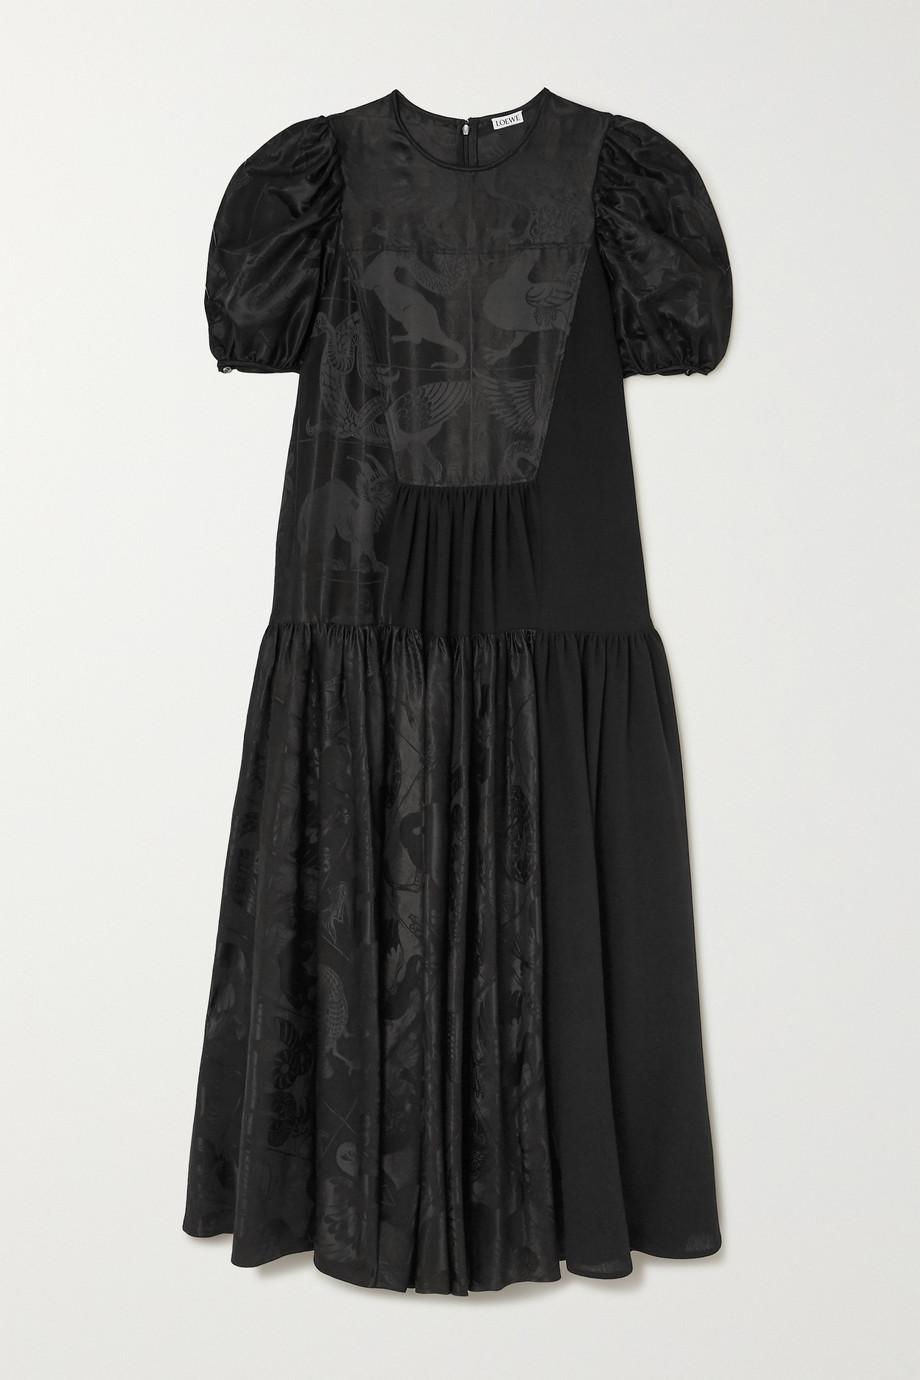 Loewe Satin-jacquard midi dress